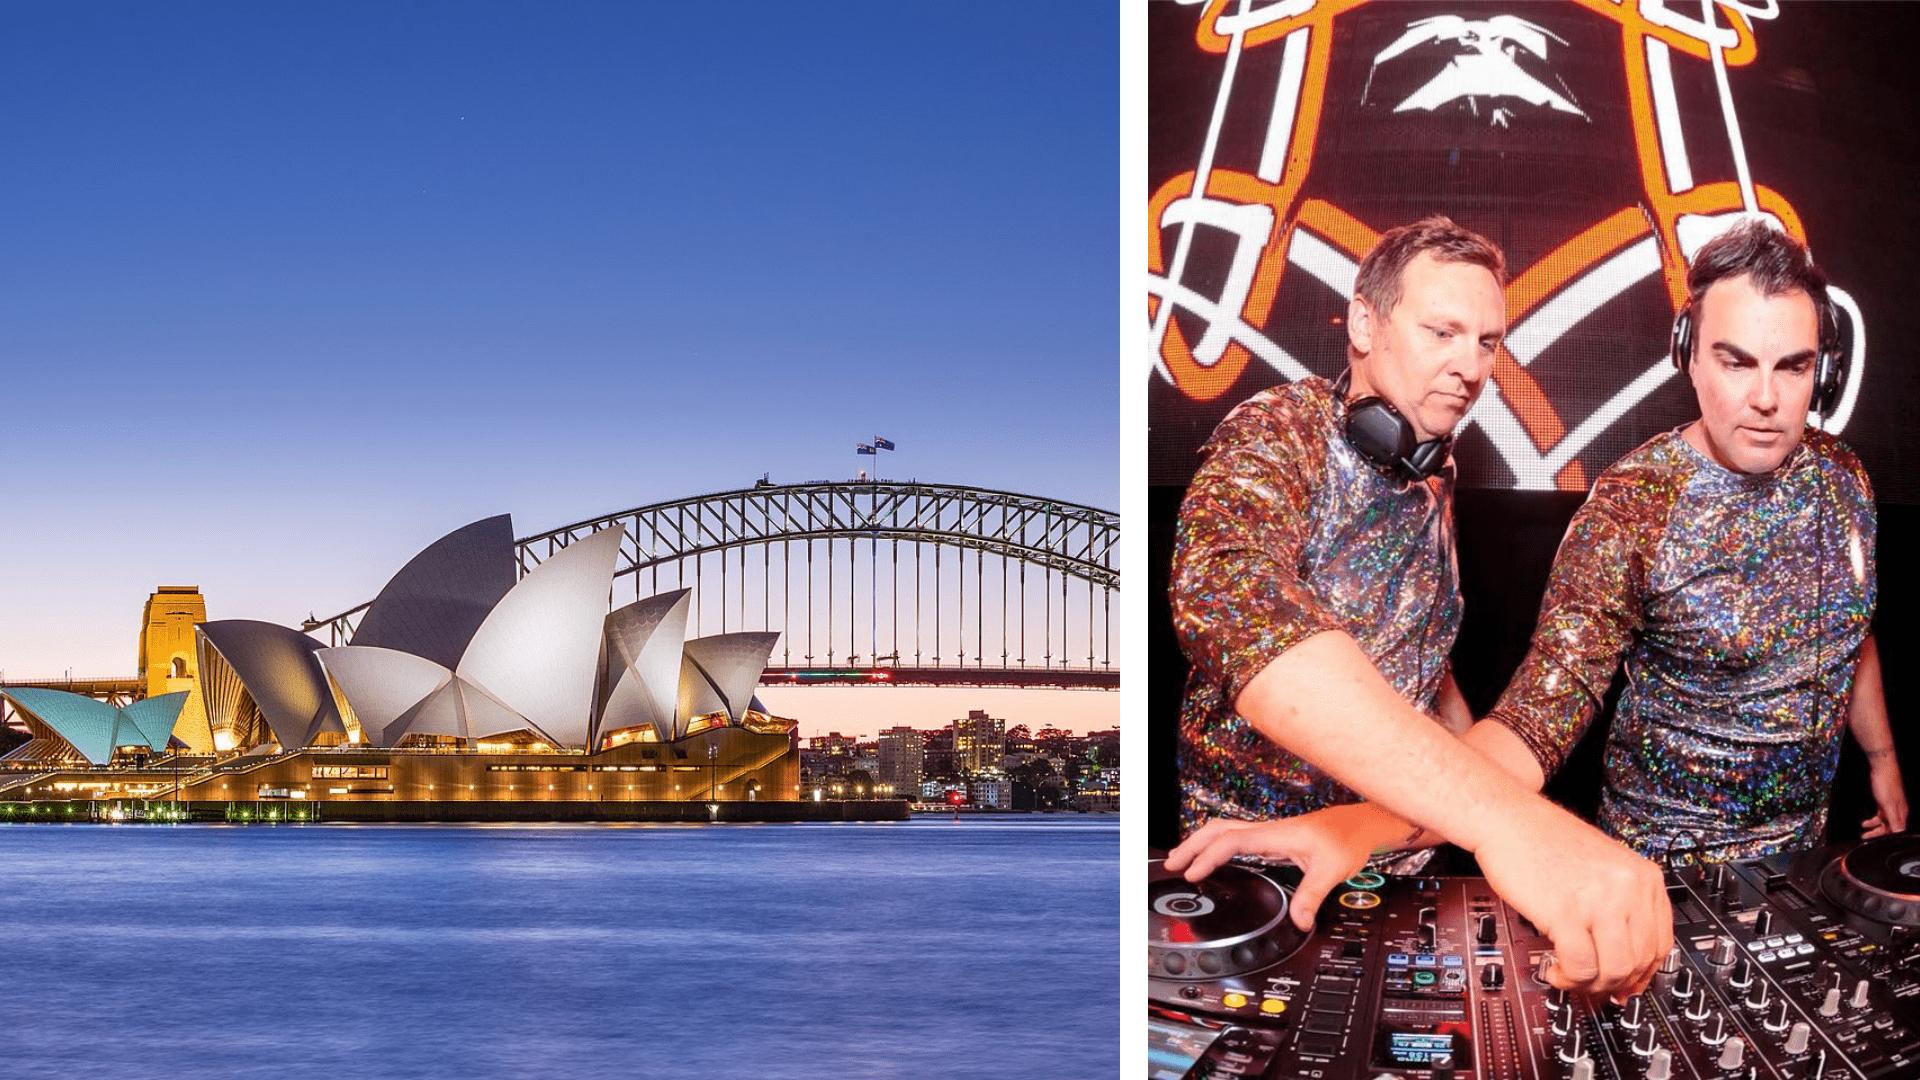 Sydney Australia, Binary Finary